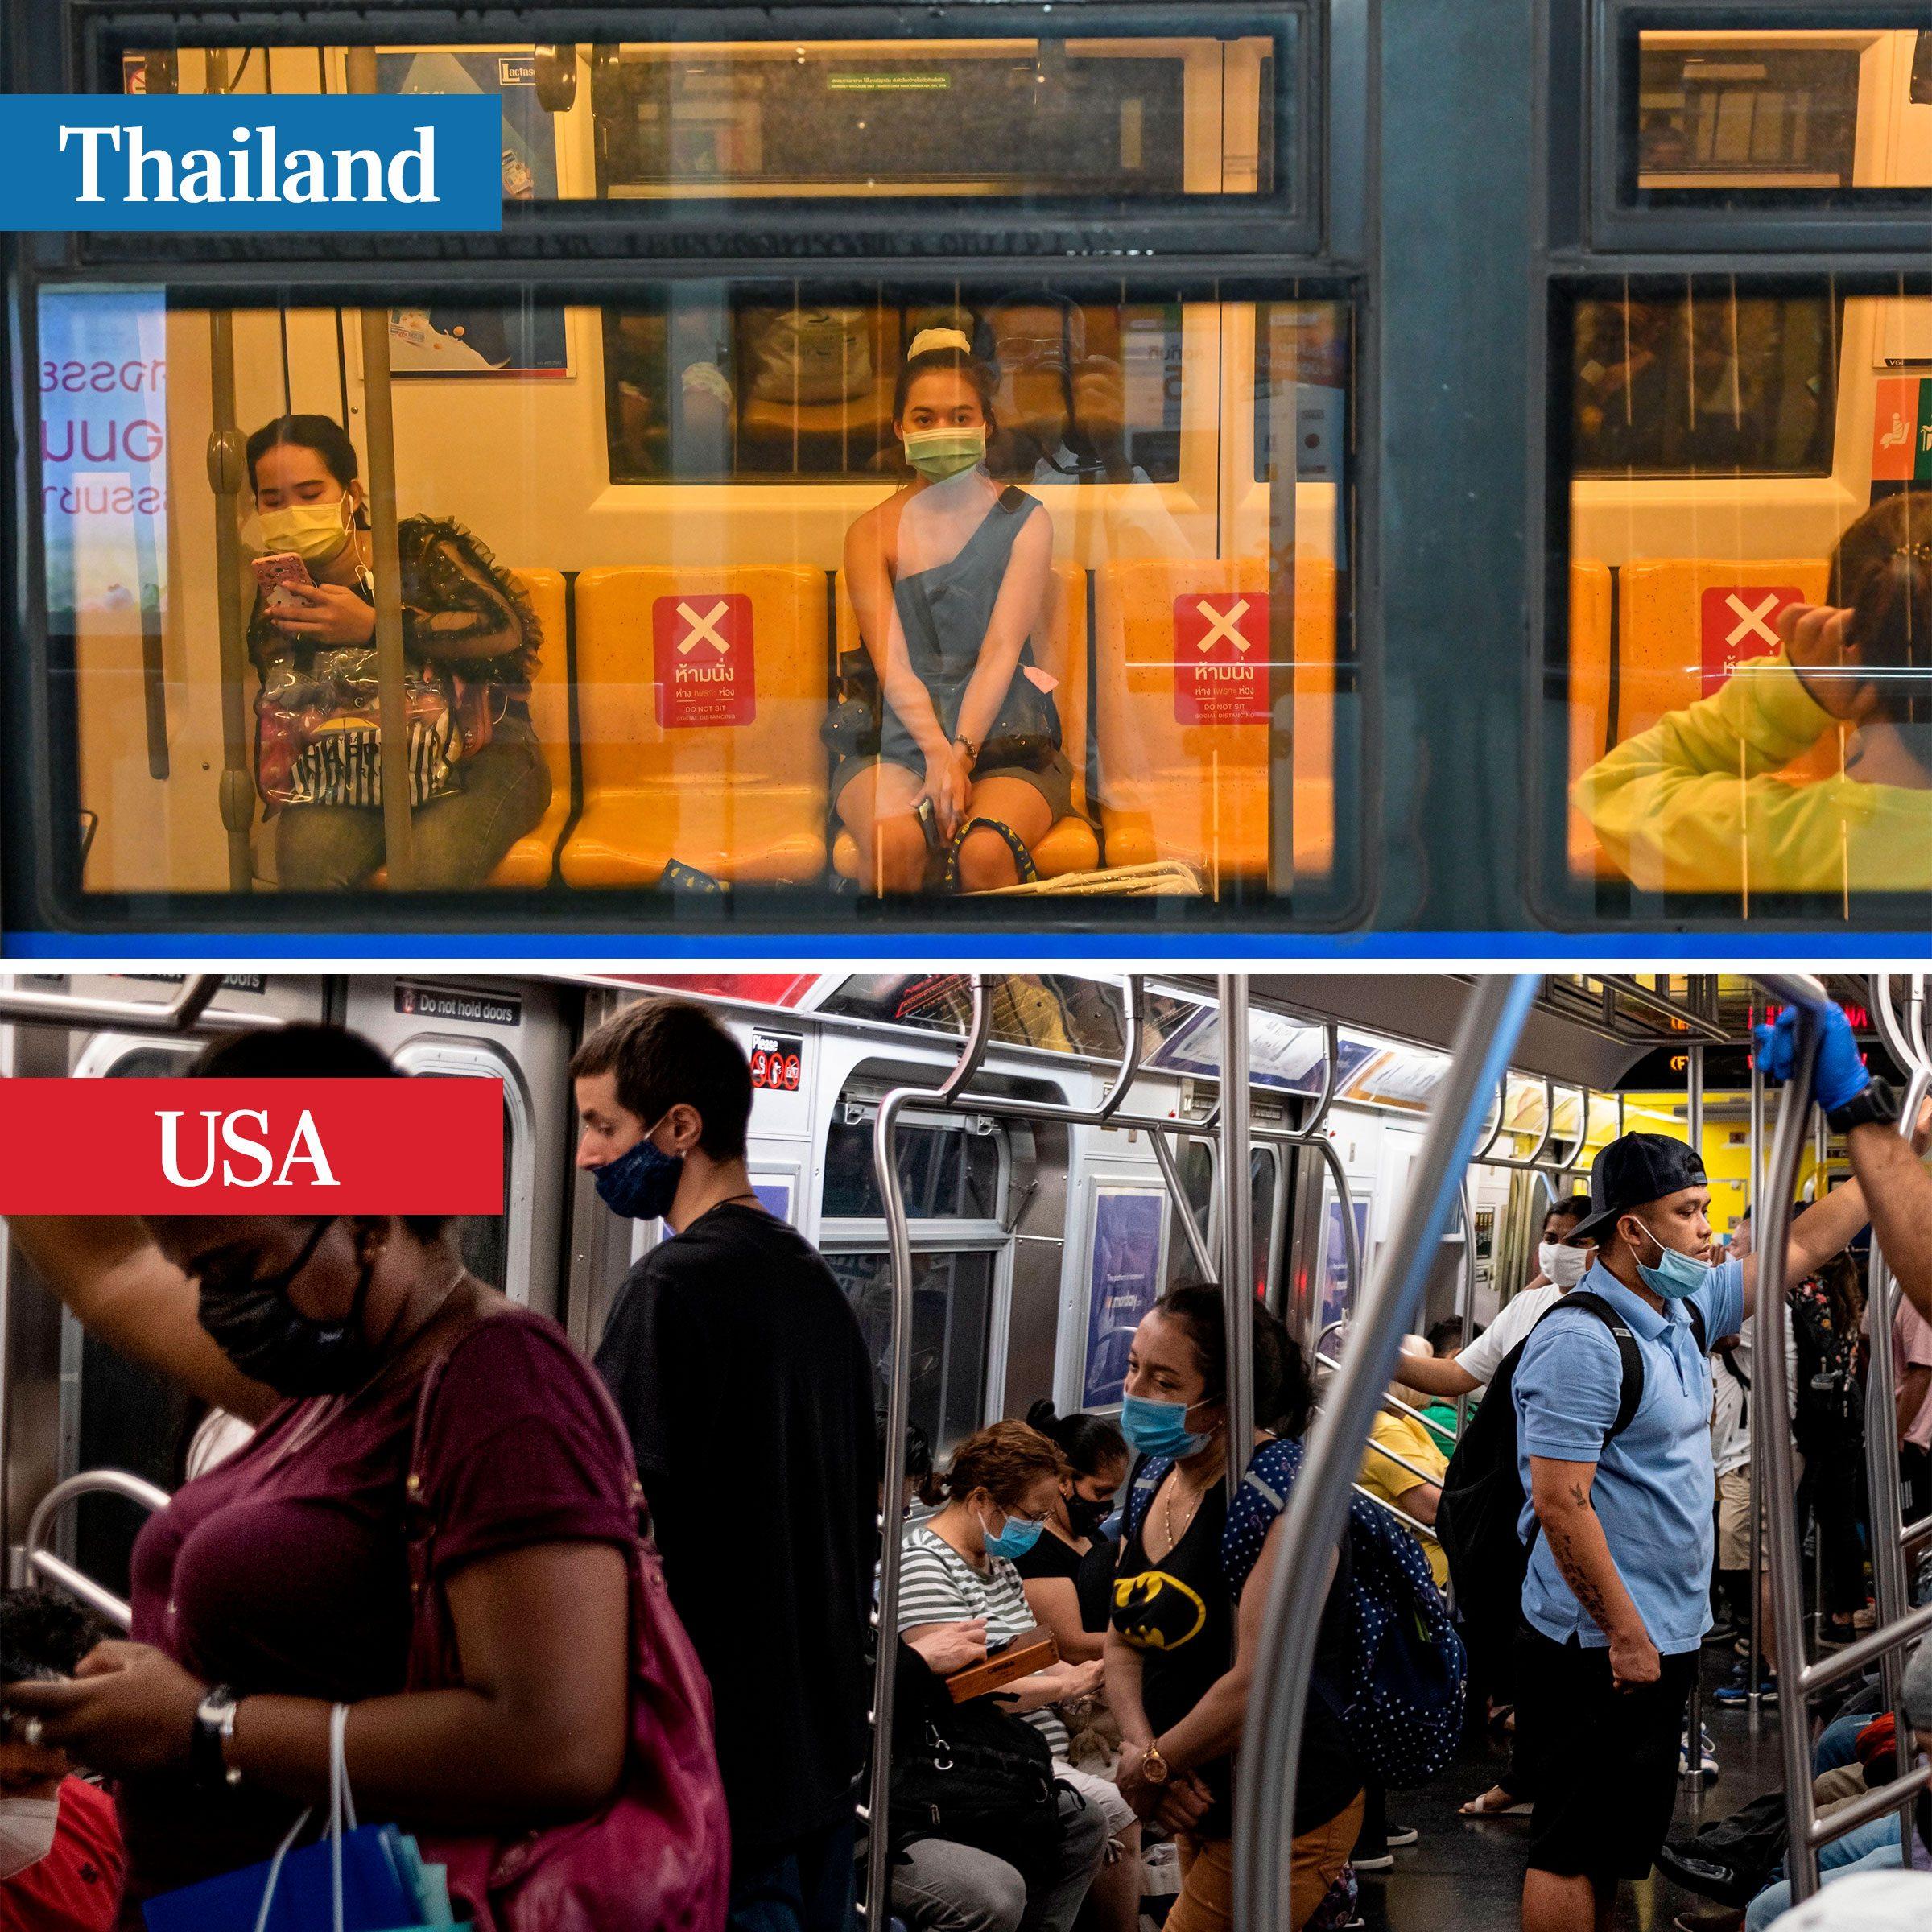 thailand vs usa - public transportation